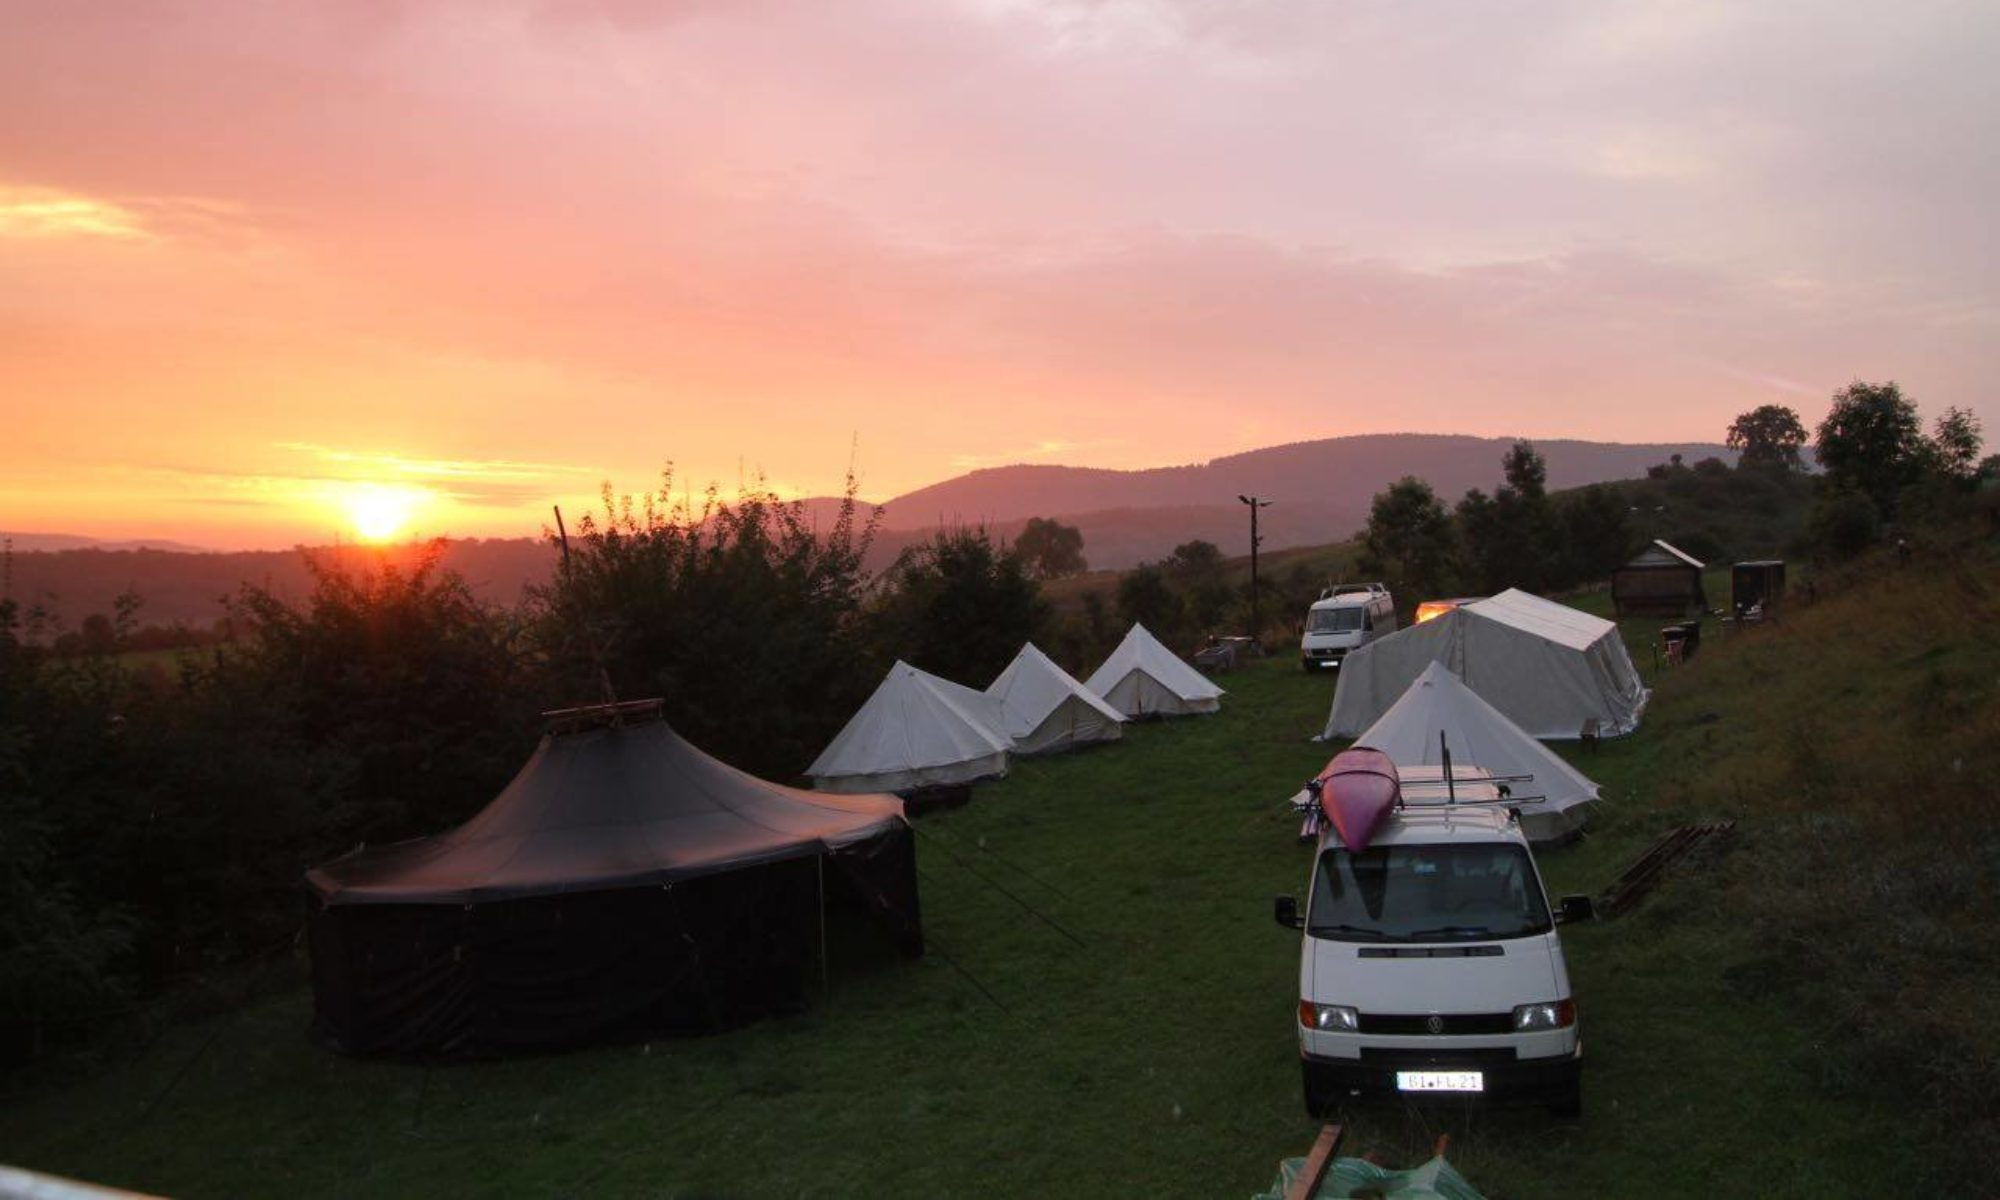 Ith Campingplatz